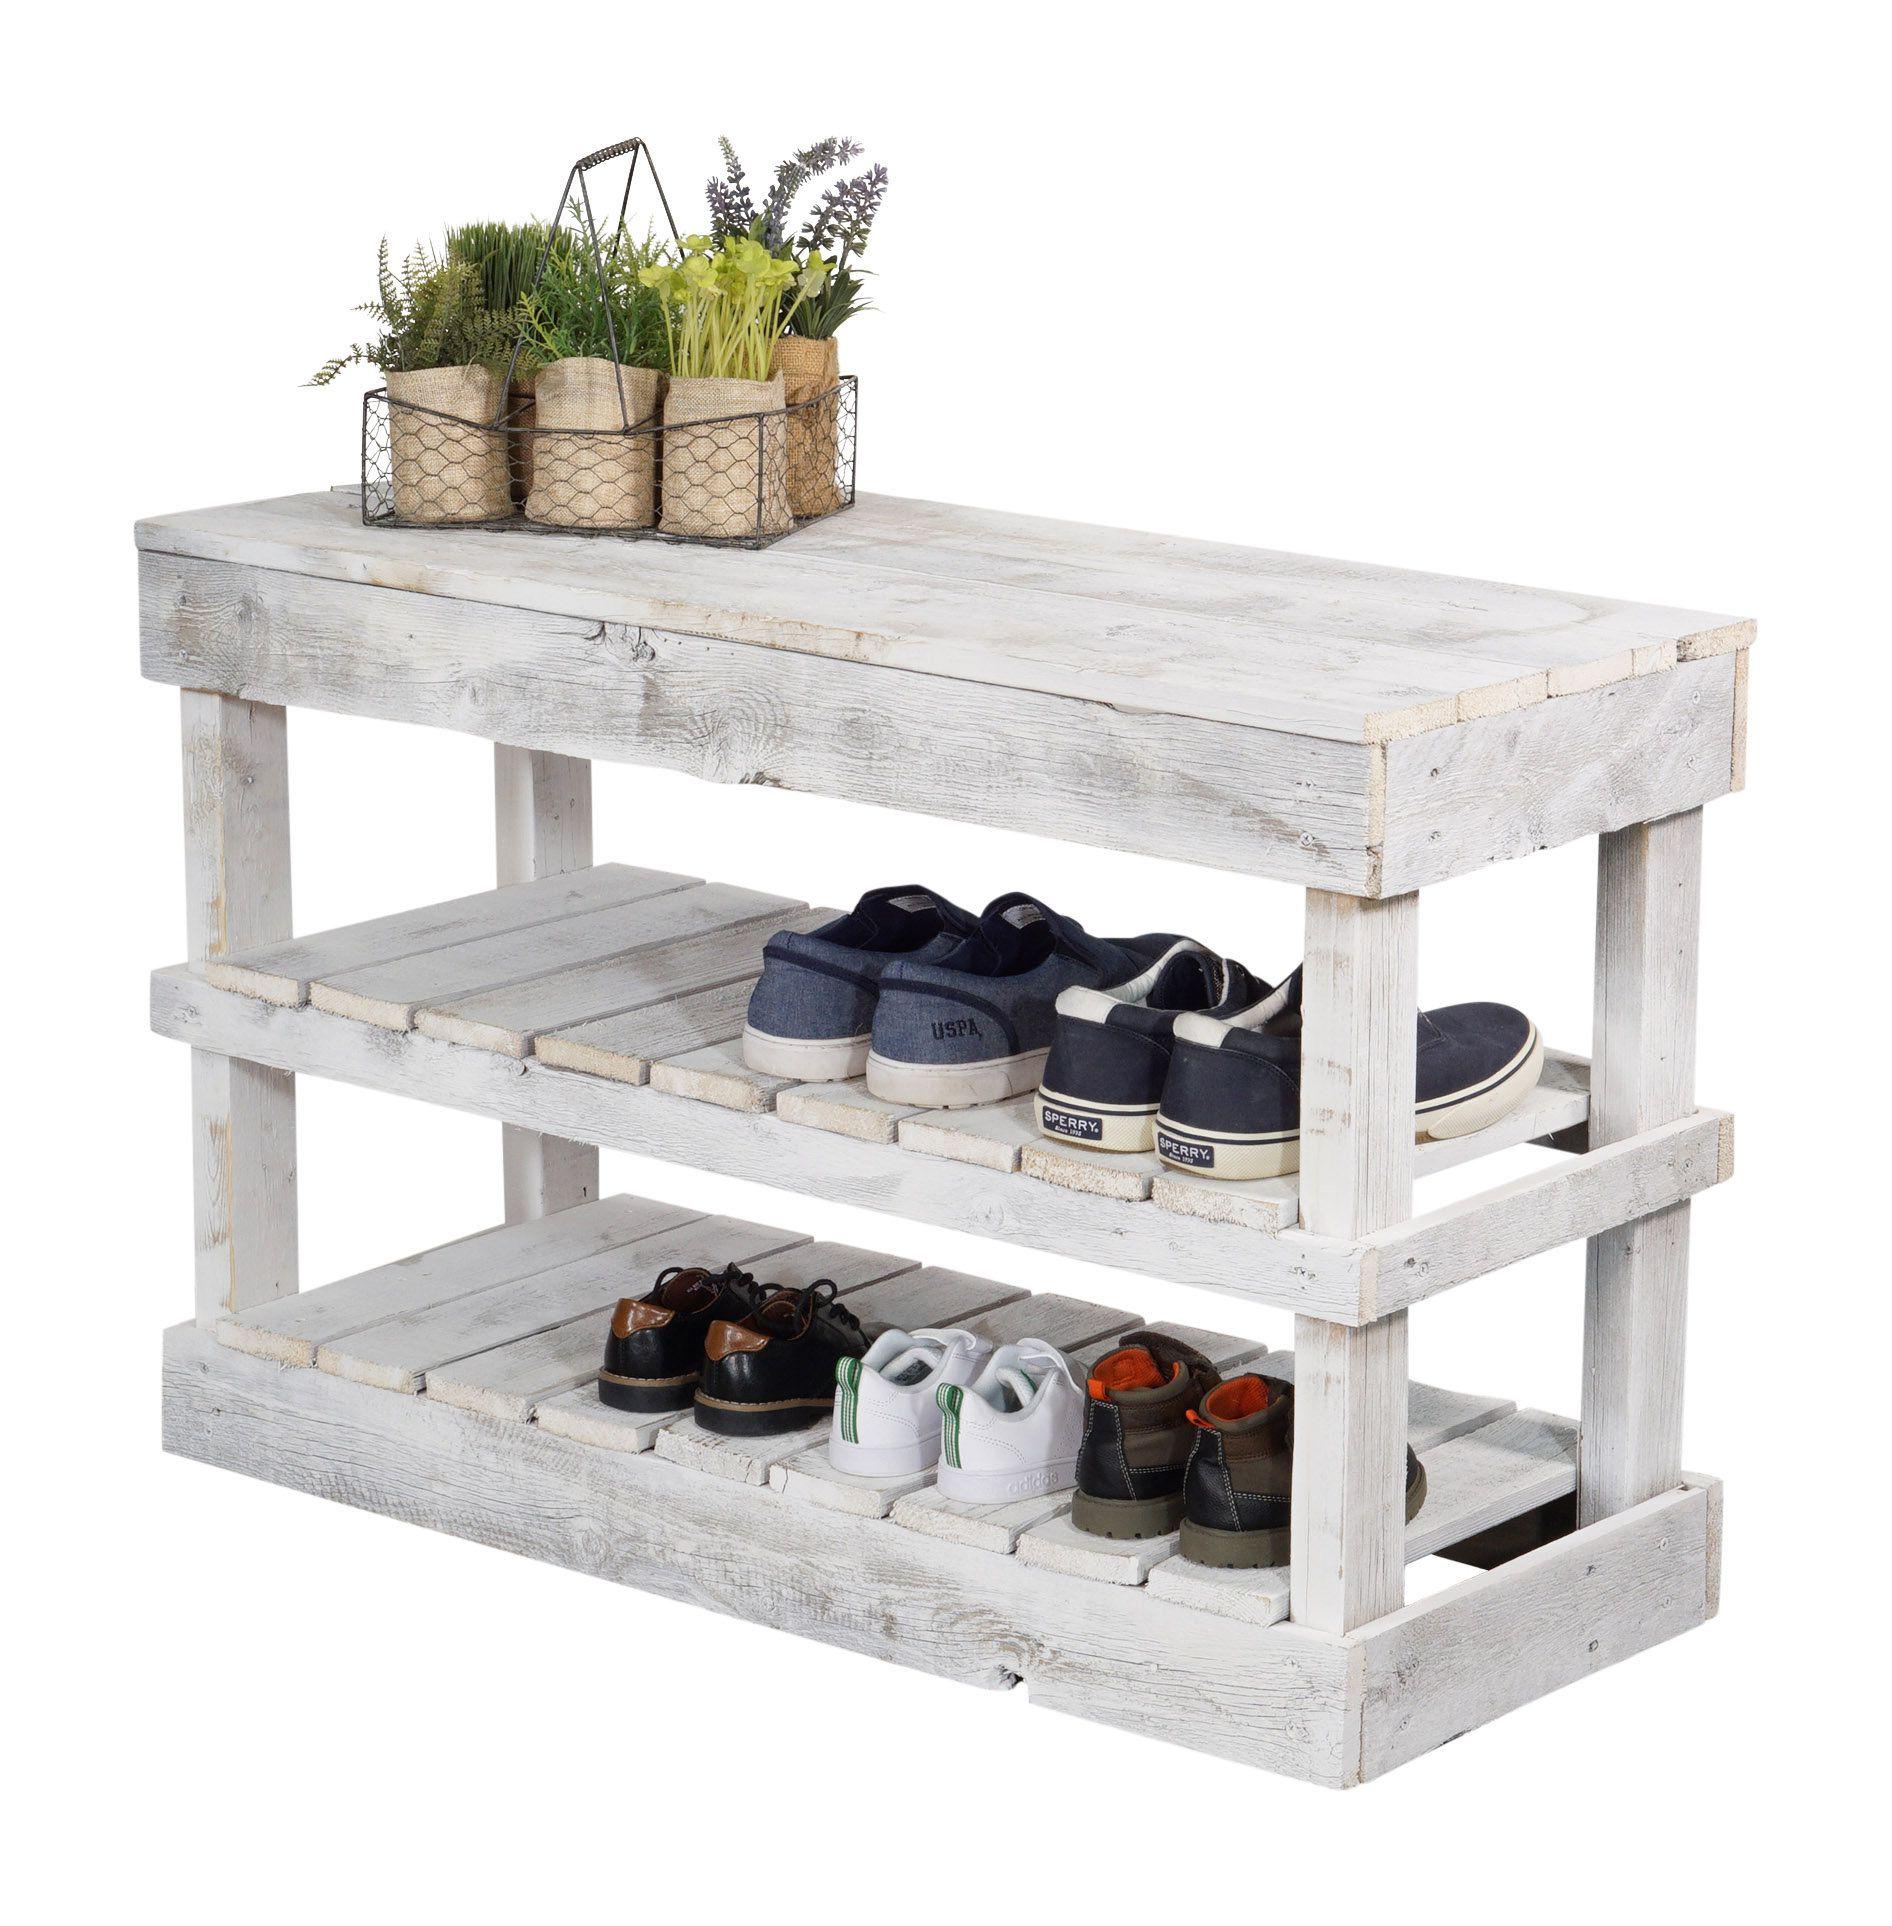 Coley pair shoe storage rack shoe storage benches storage